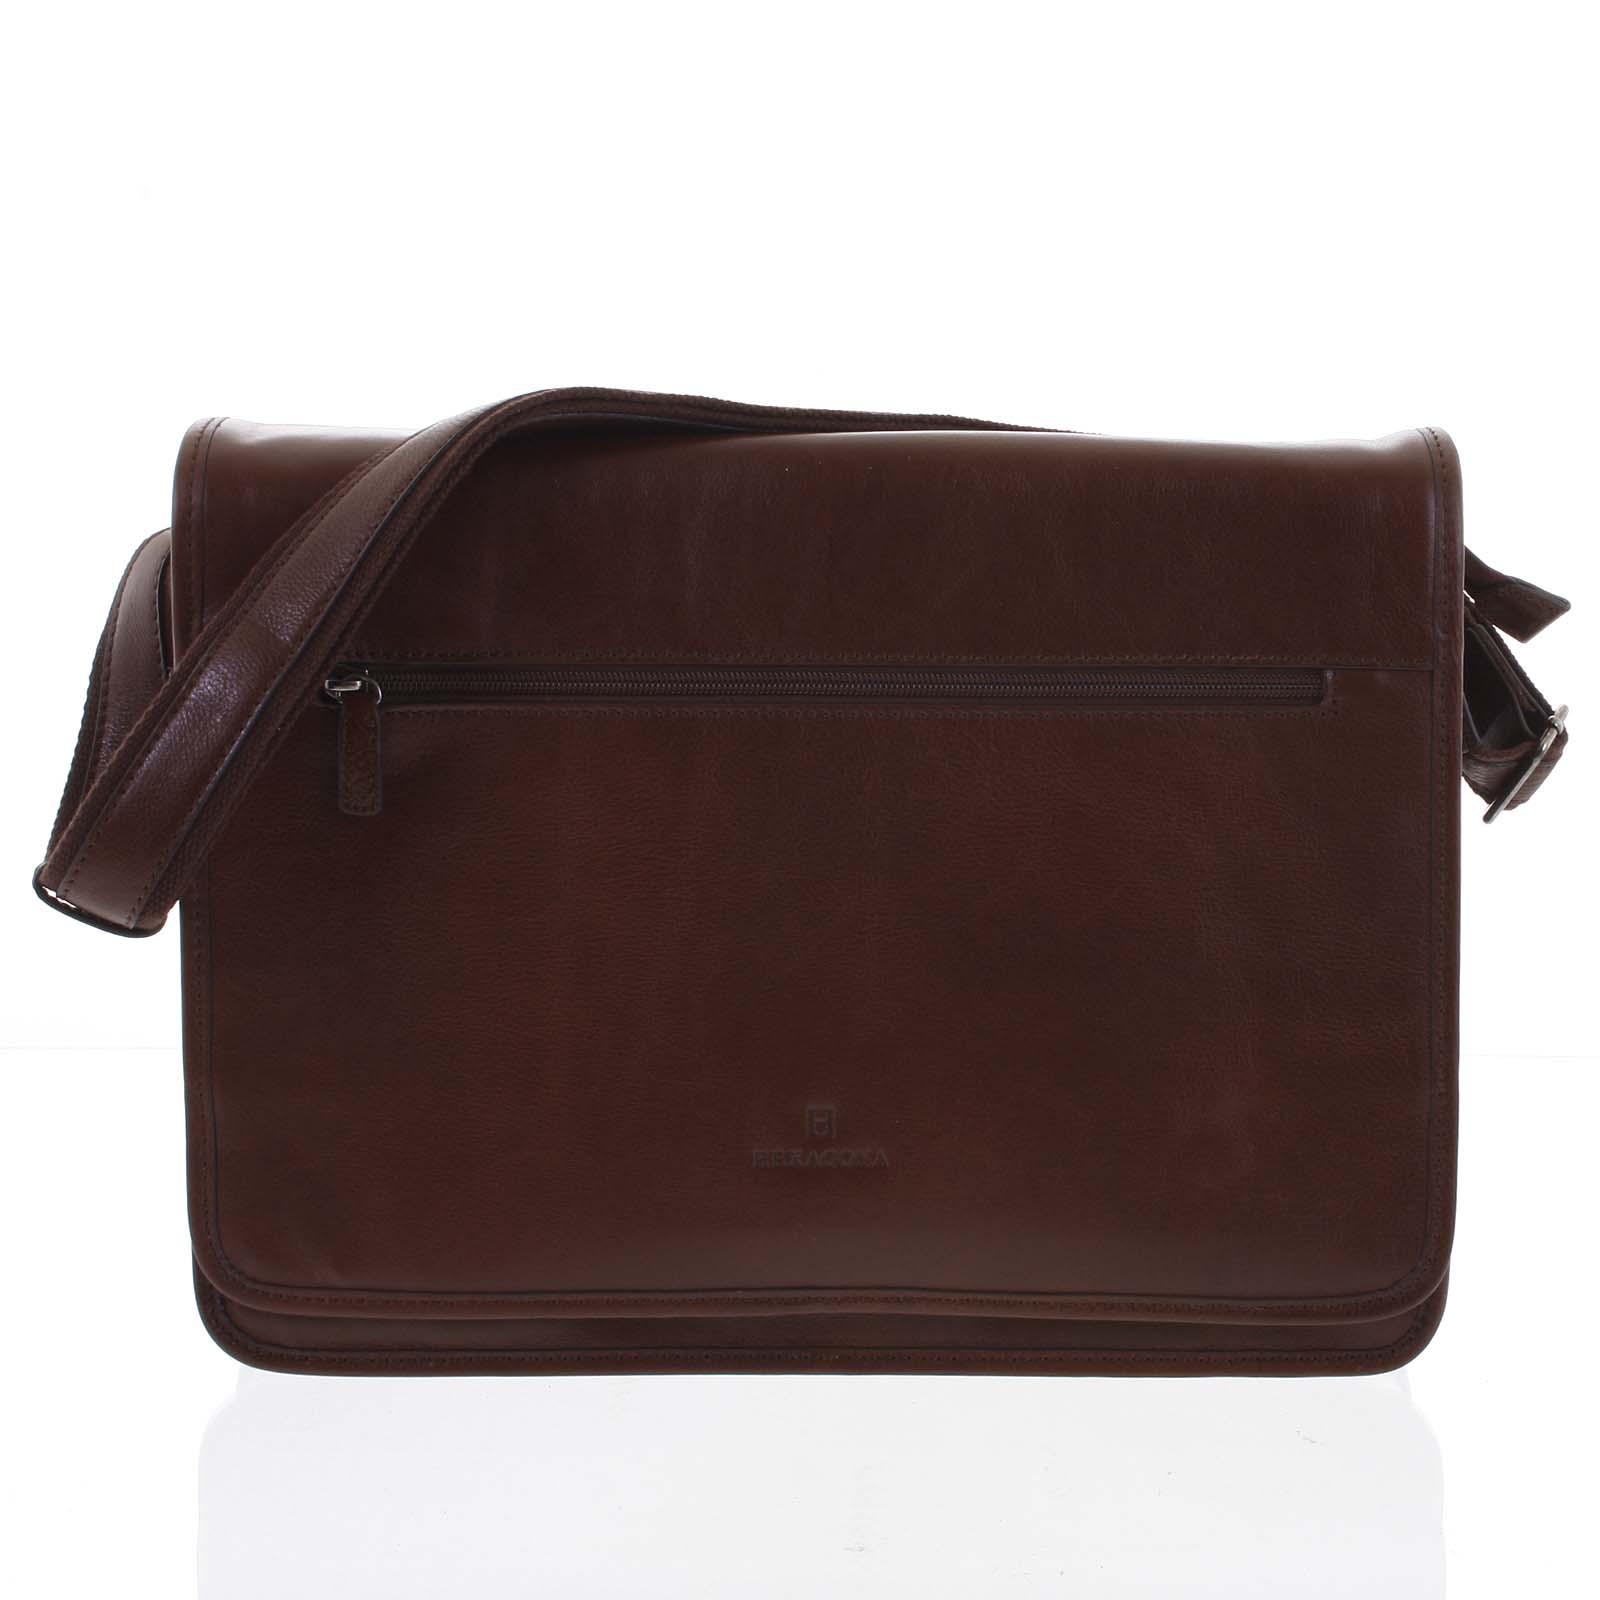 Kaštanově hnědá kožená business taška Hexagona 123482